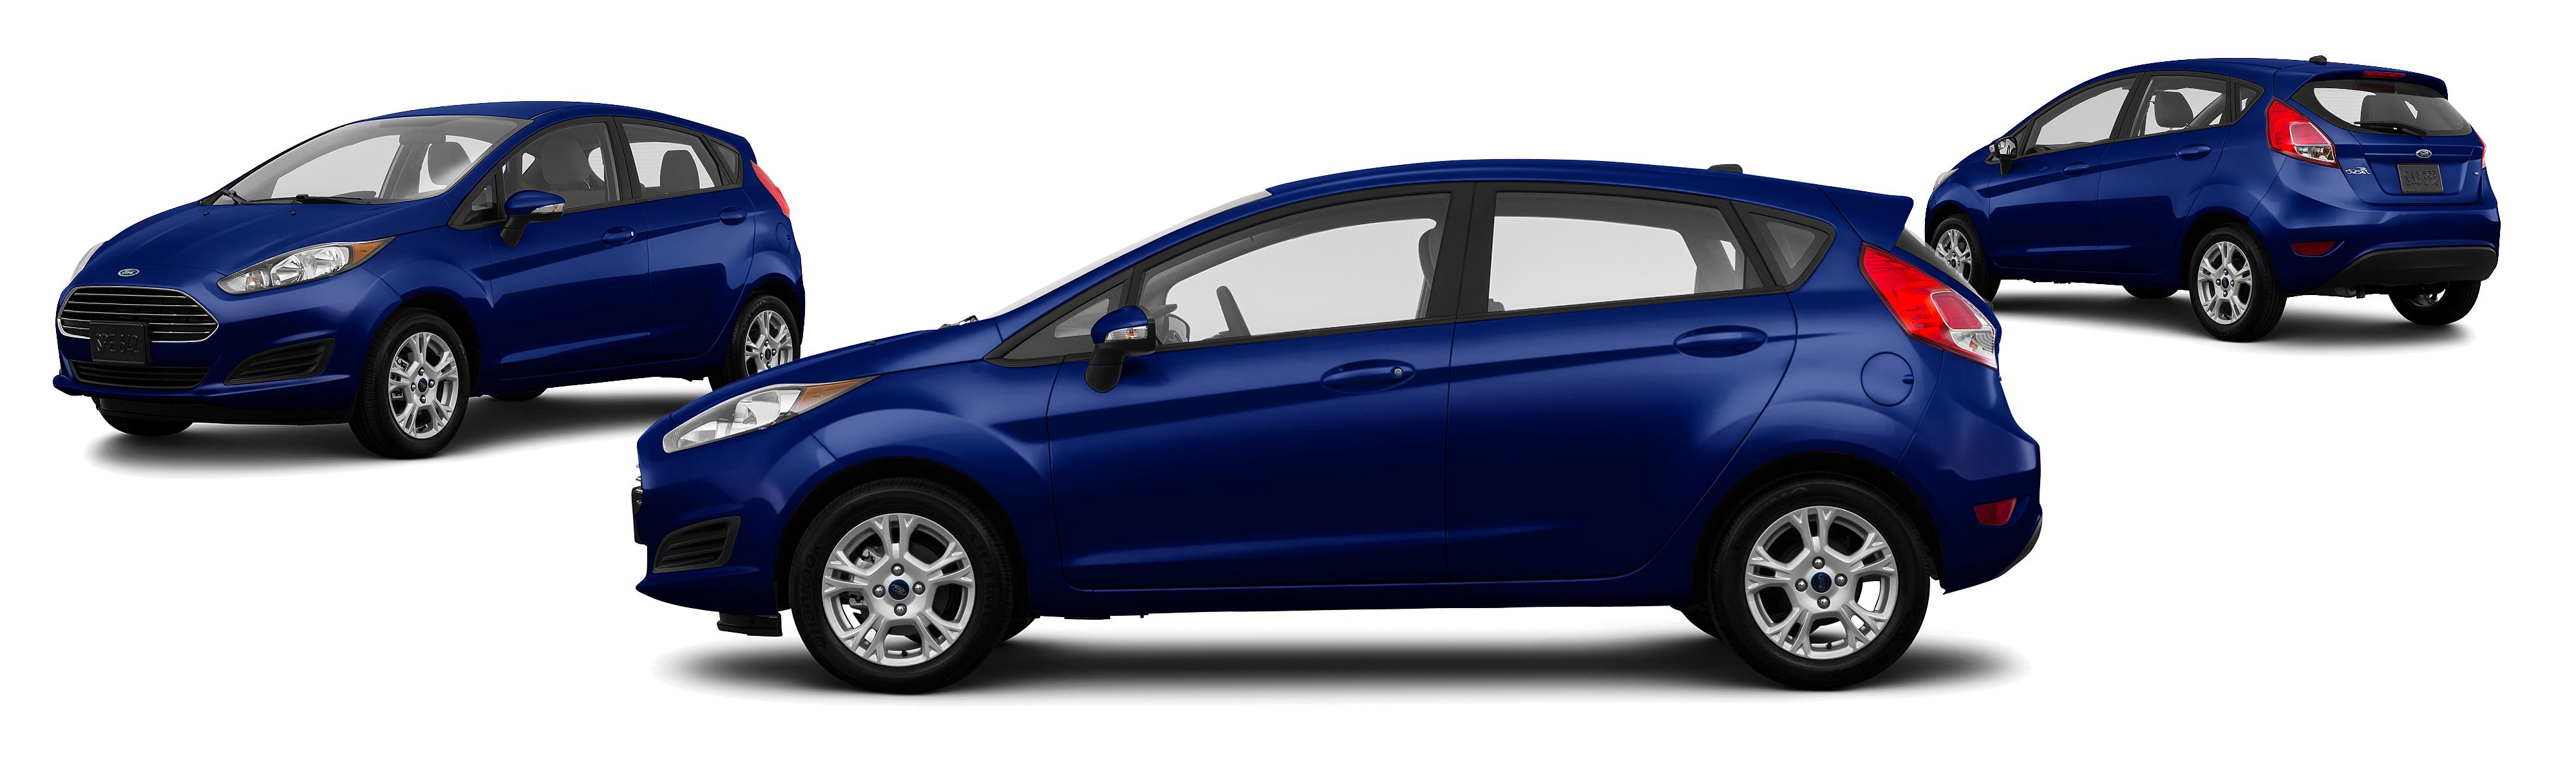 2016 Ford Fiesta SE 4dr Hatchback - Research - GrooveCar